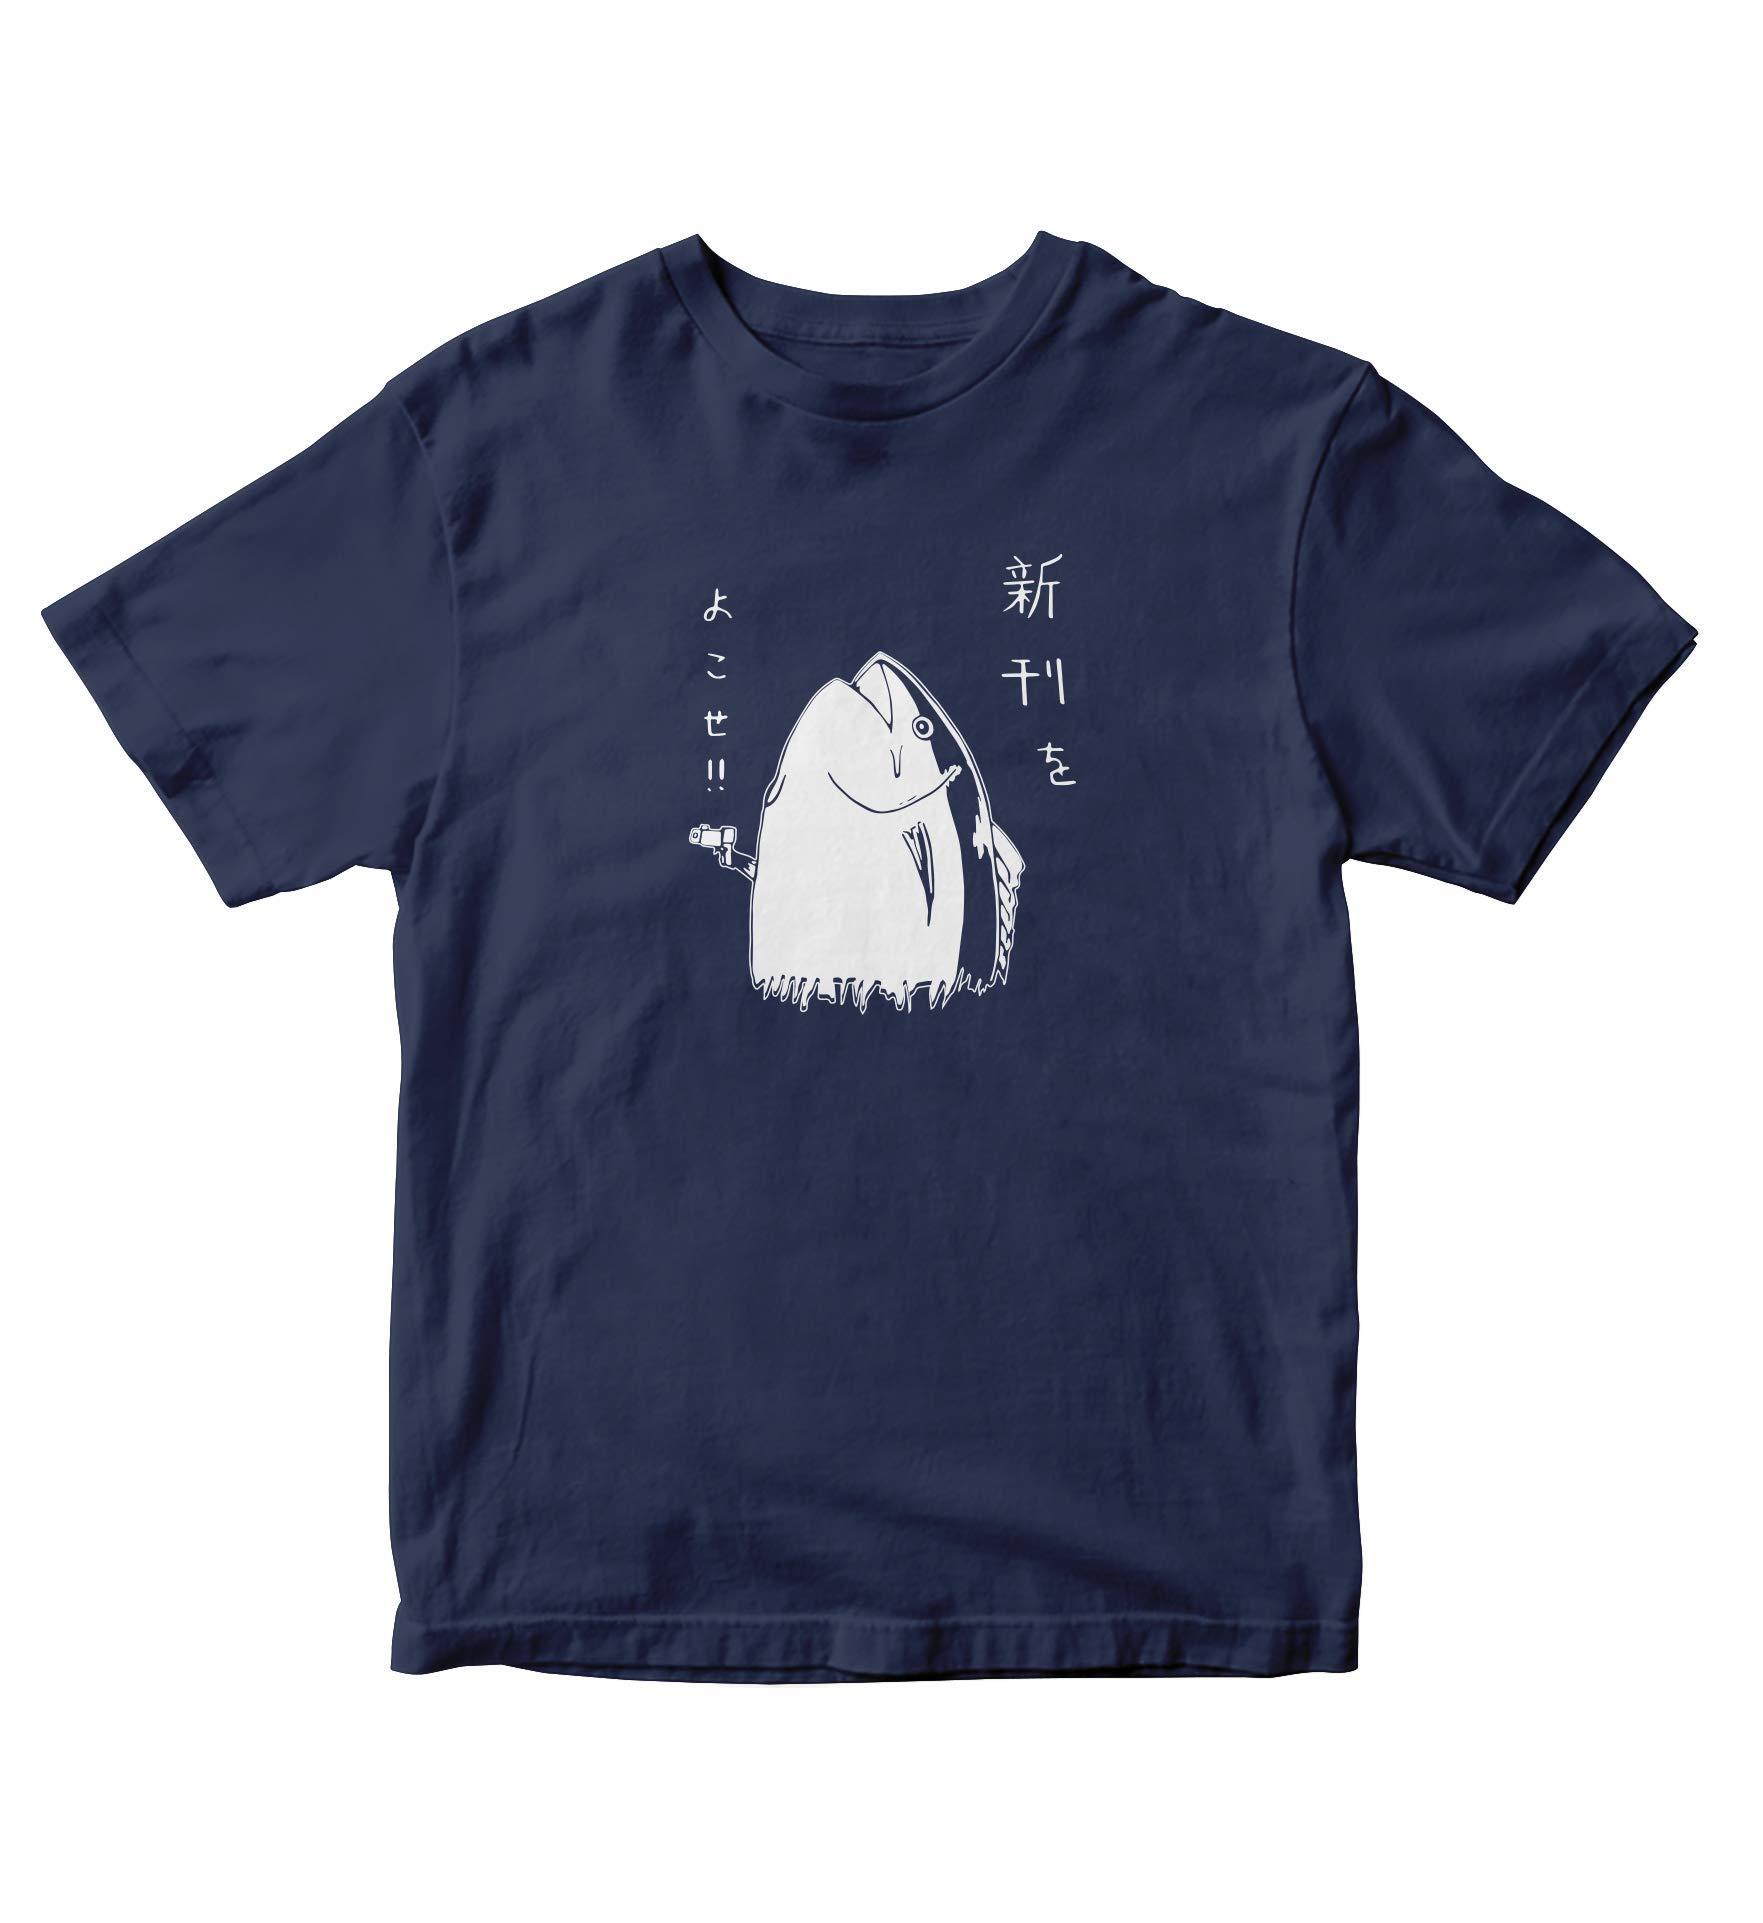 Hold On Japanese Fish Navy Blue Shirt Anime Manga S A730